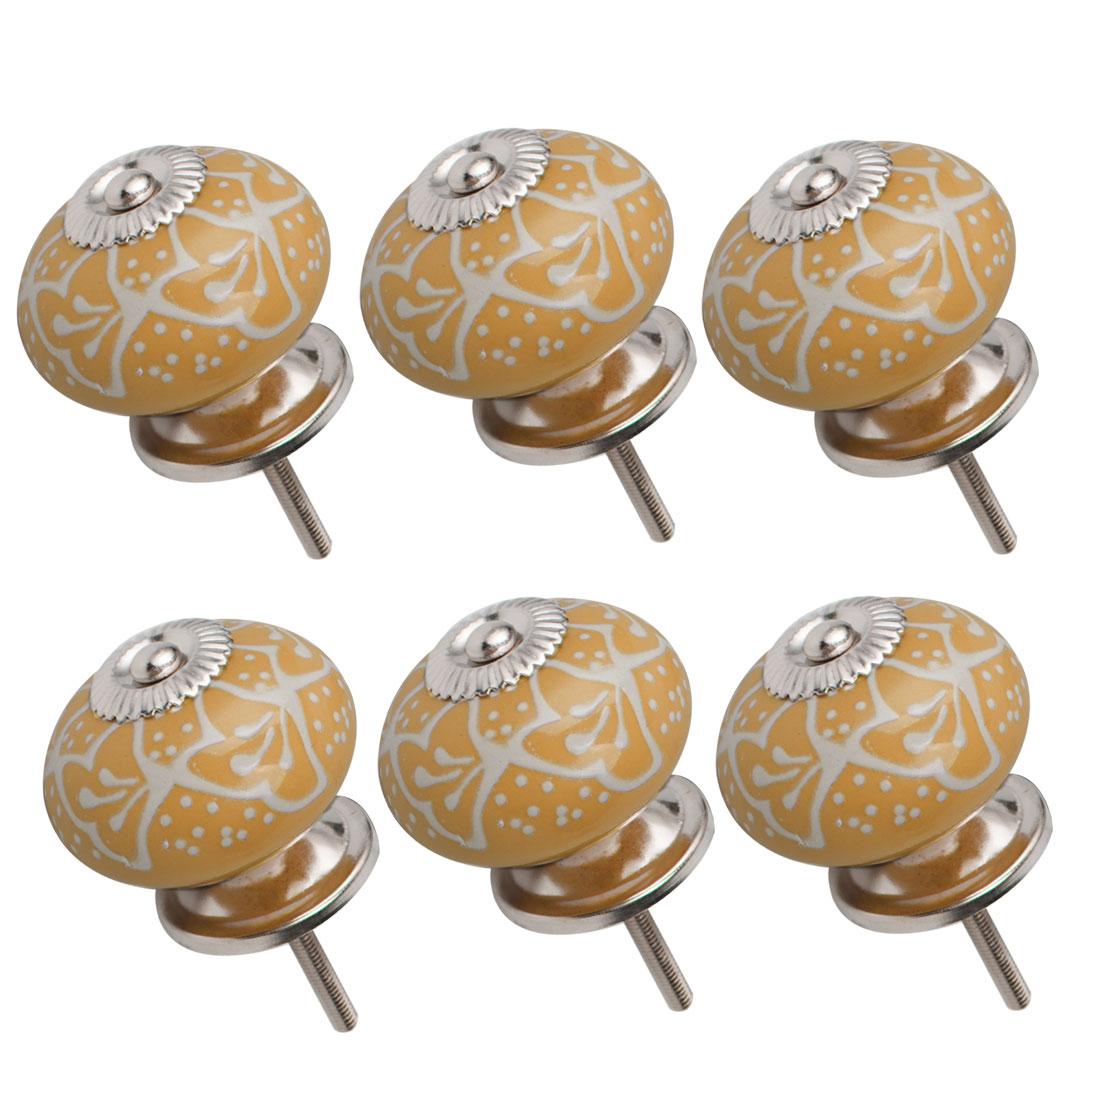 Ceramic Knob Drawers Round Pull Handle Cabinet Wardrobe Dresser Door 6pcs Yellow